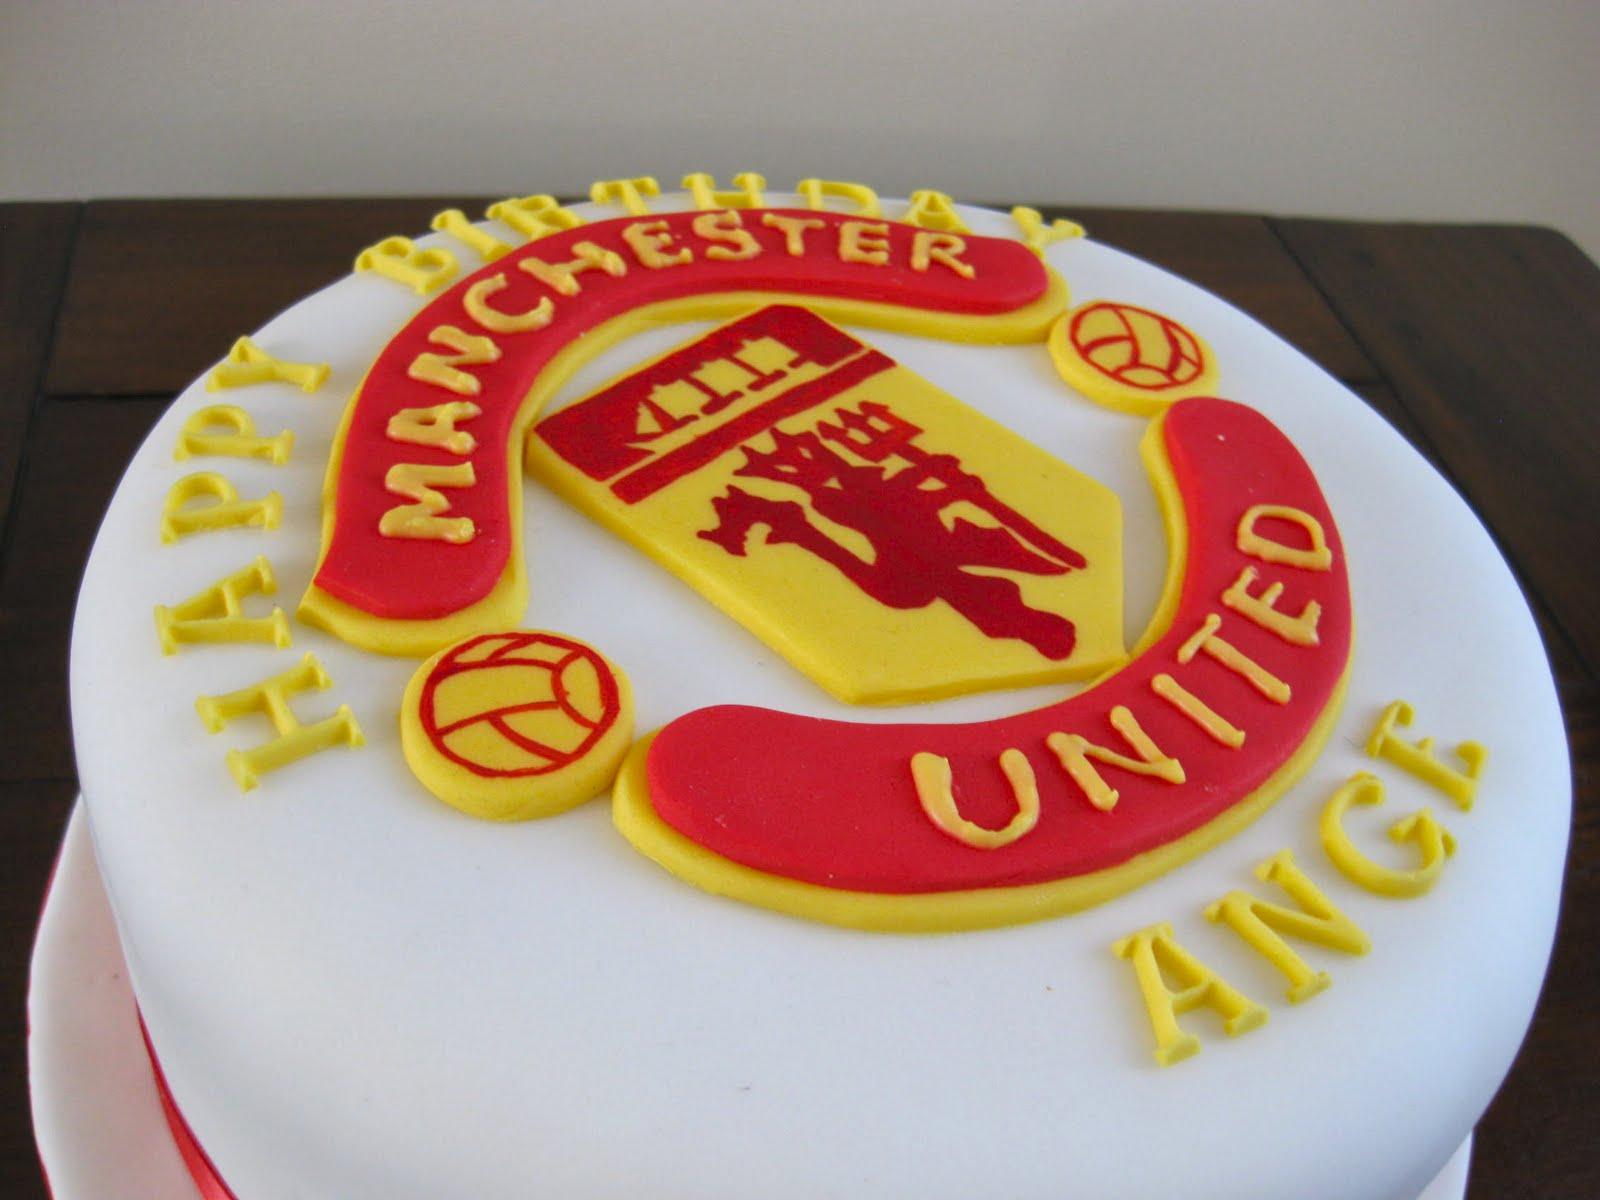 Manchester United Badge Cake Boutique Cake Shop